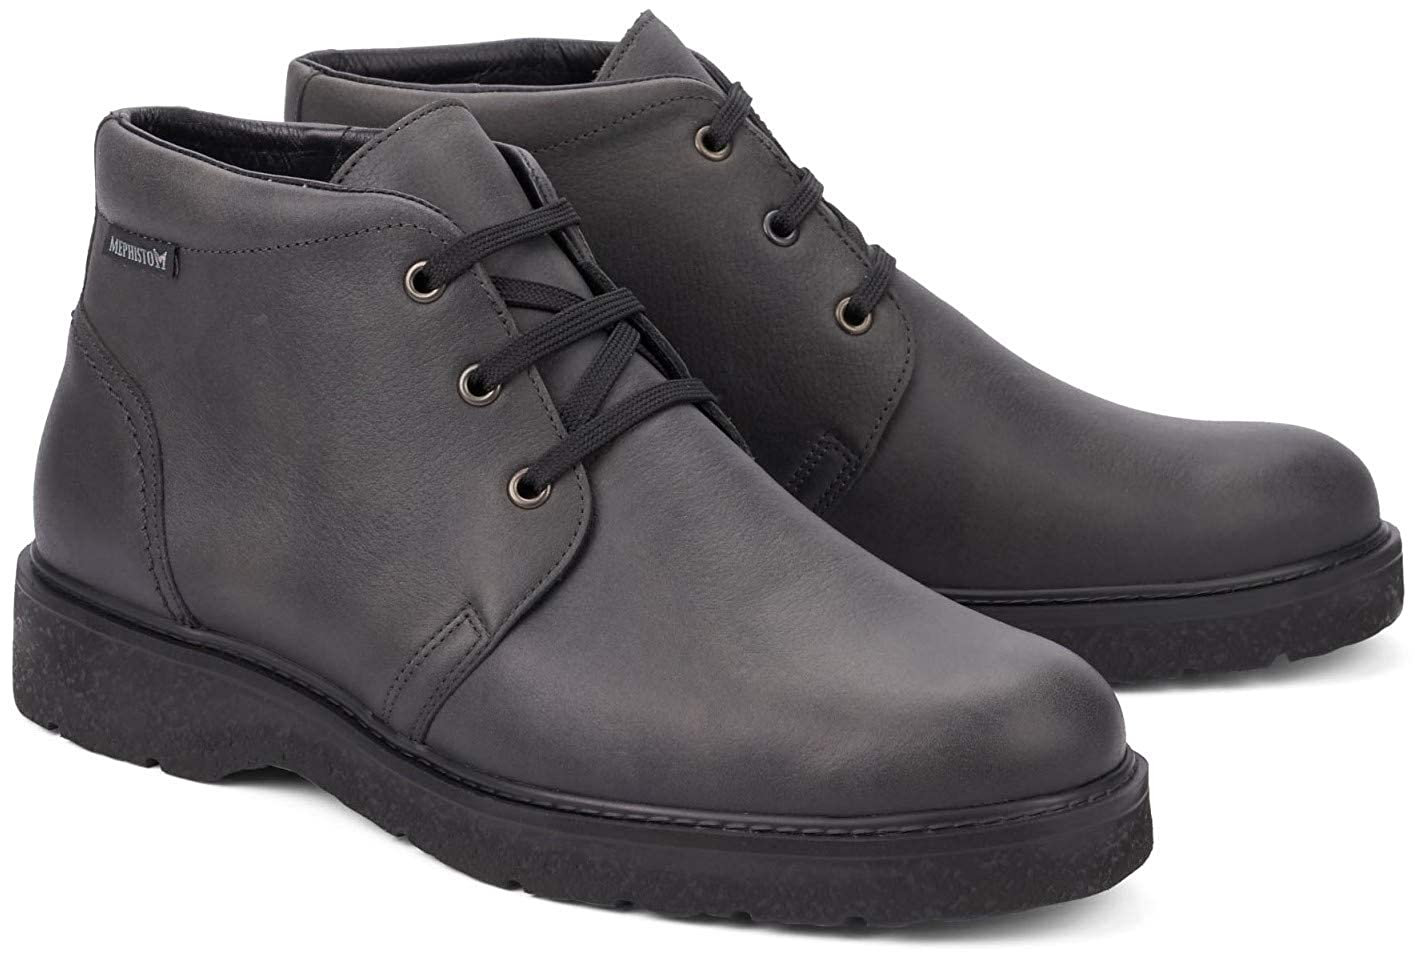 Mephisto Emanuel Leather Winter Winter Winter Stiefel for Men Dark grau b5e31d